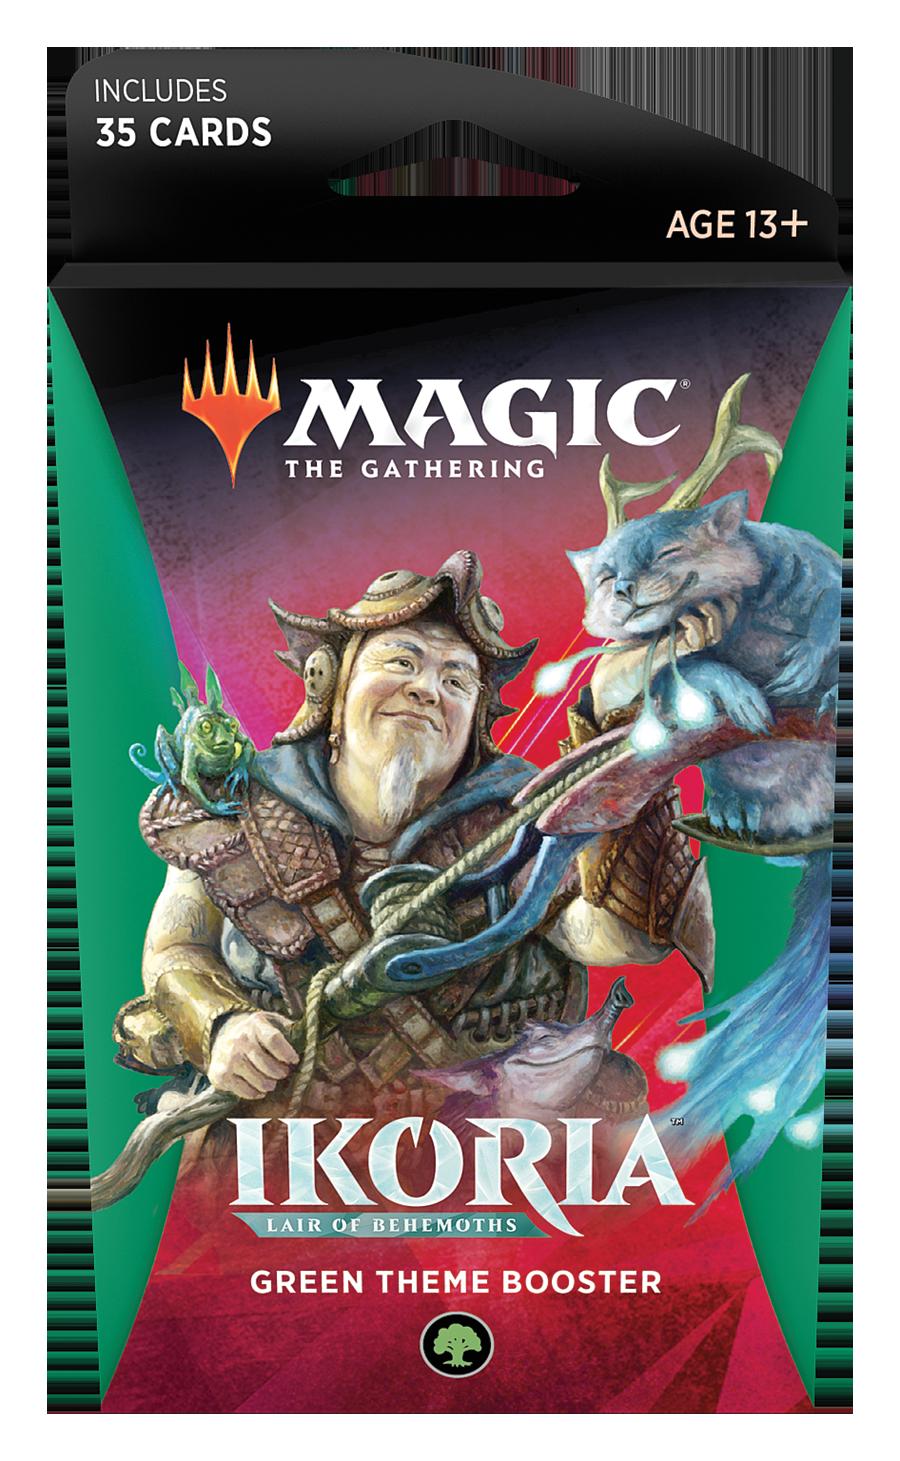 Magic the Gathering: Ikoria: Lair of Behemoths - Theme Booster Green image